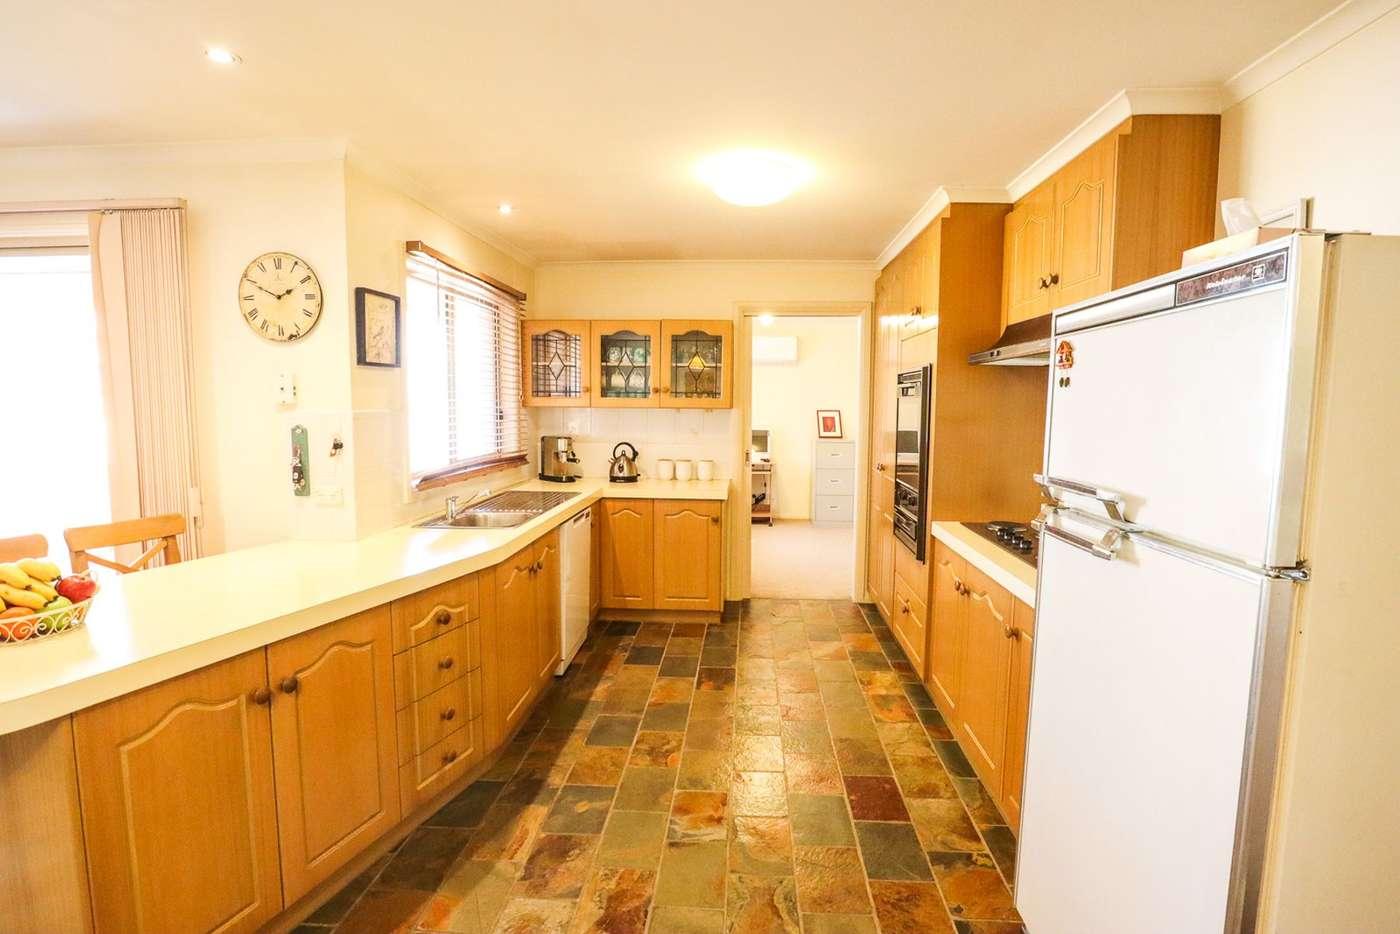 Sixth view of Homely house listing, 10 Patricia Drive, Mildura VIC 3500